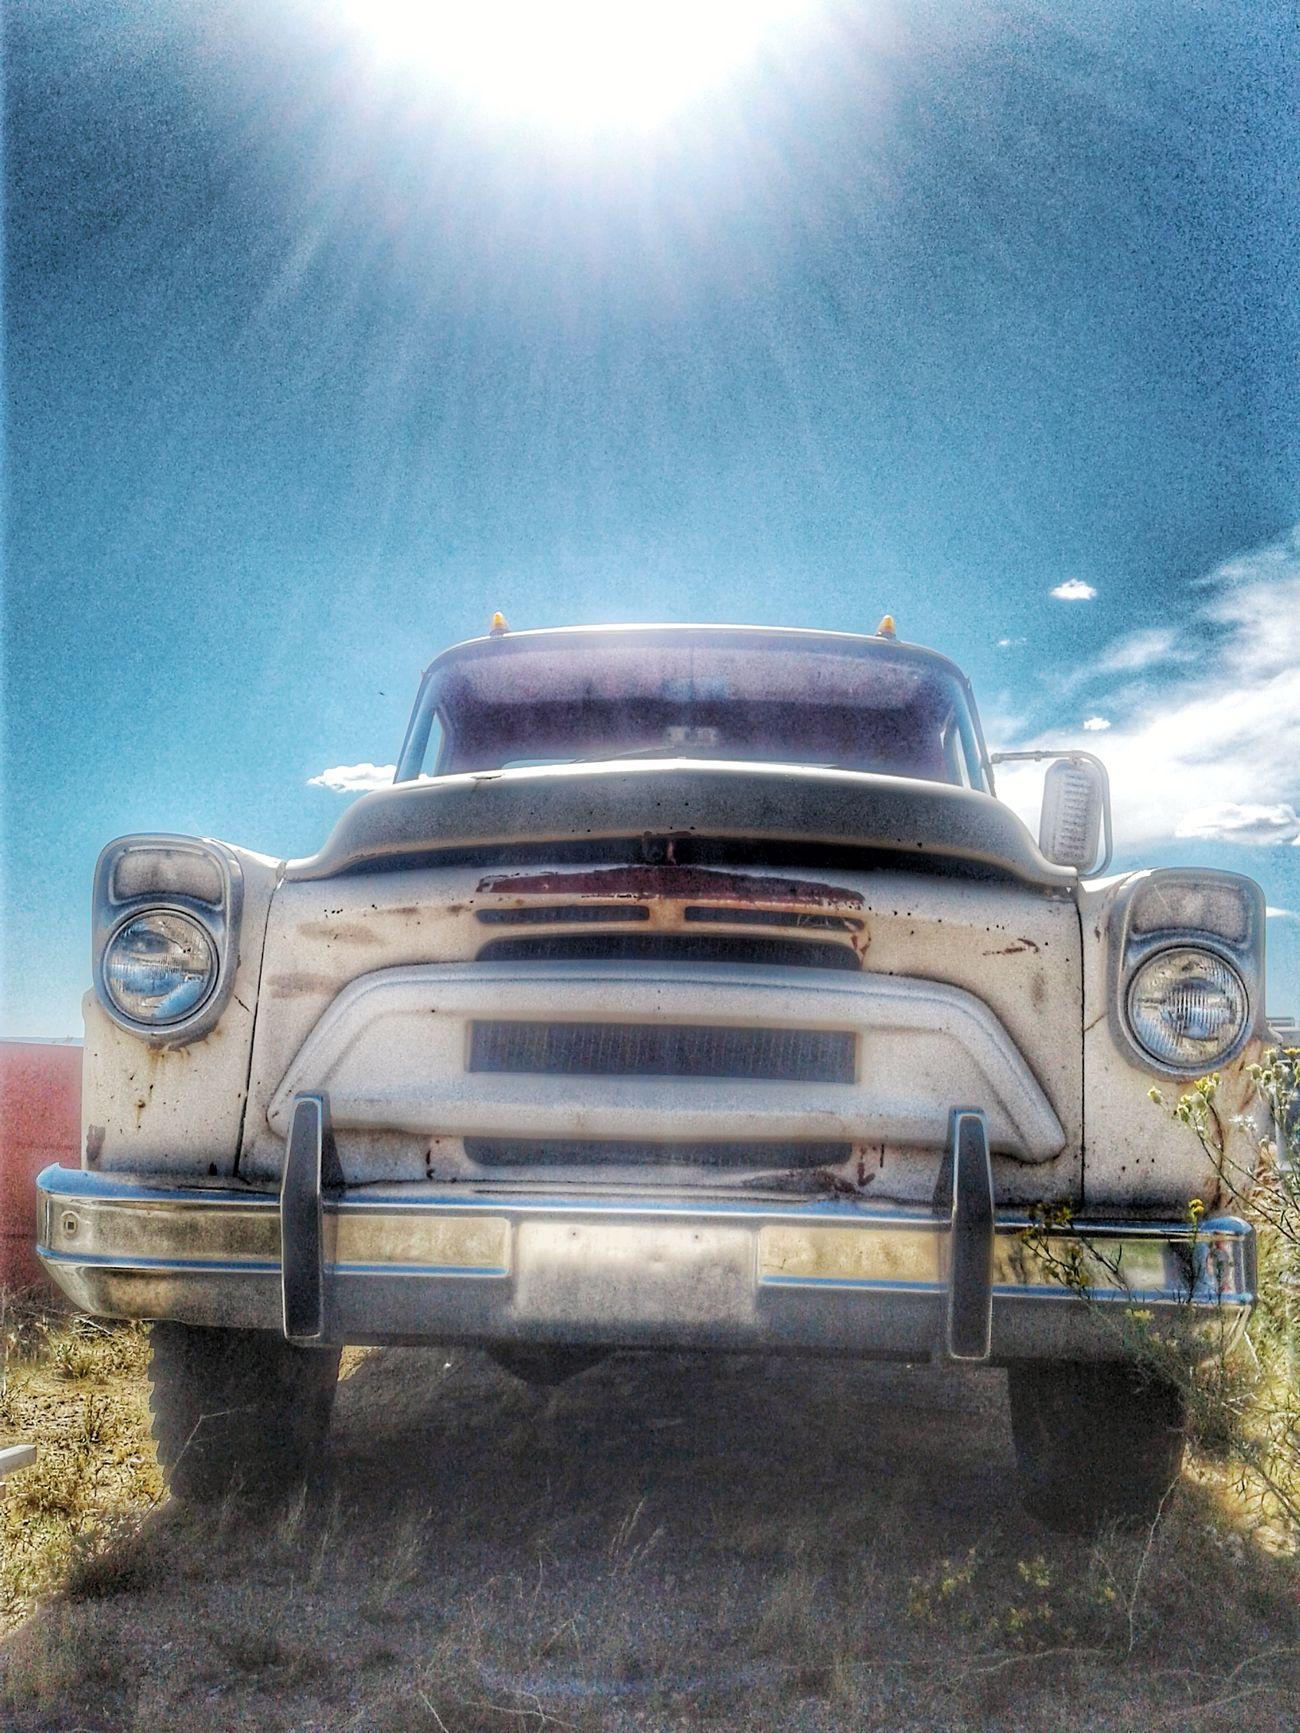 Car Semi-truck No People Space Sky Outdoors Day EyeEm Best Shots Desert Landscape Desolate International Harvester Tallac